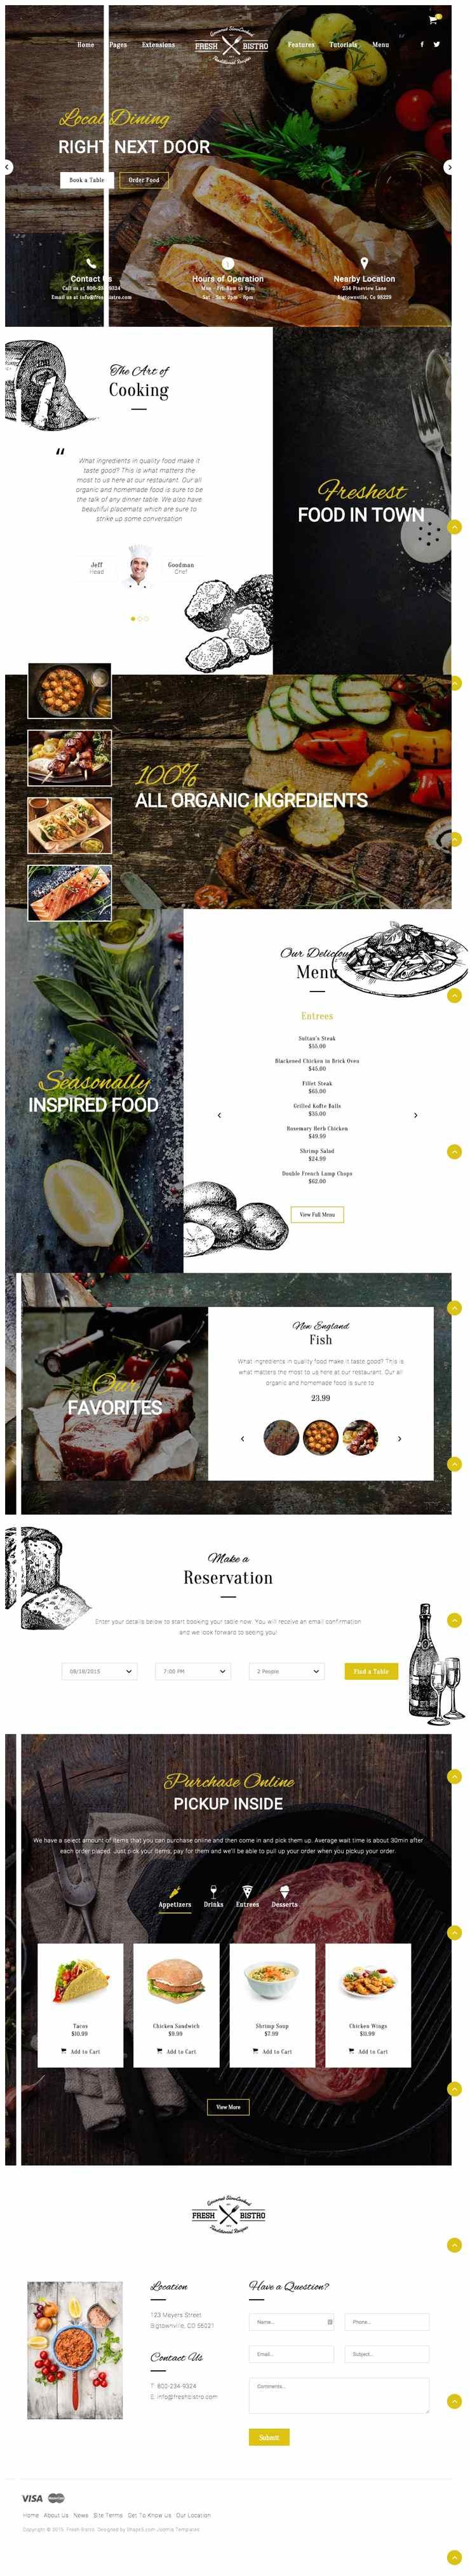 Fresh Bistro Joomla Restaurant or Dining Template